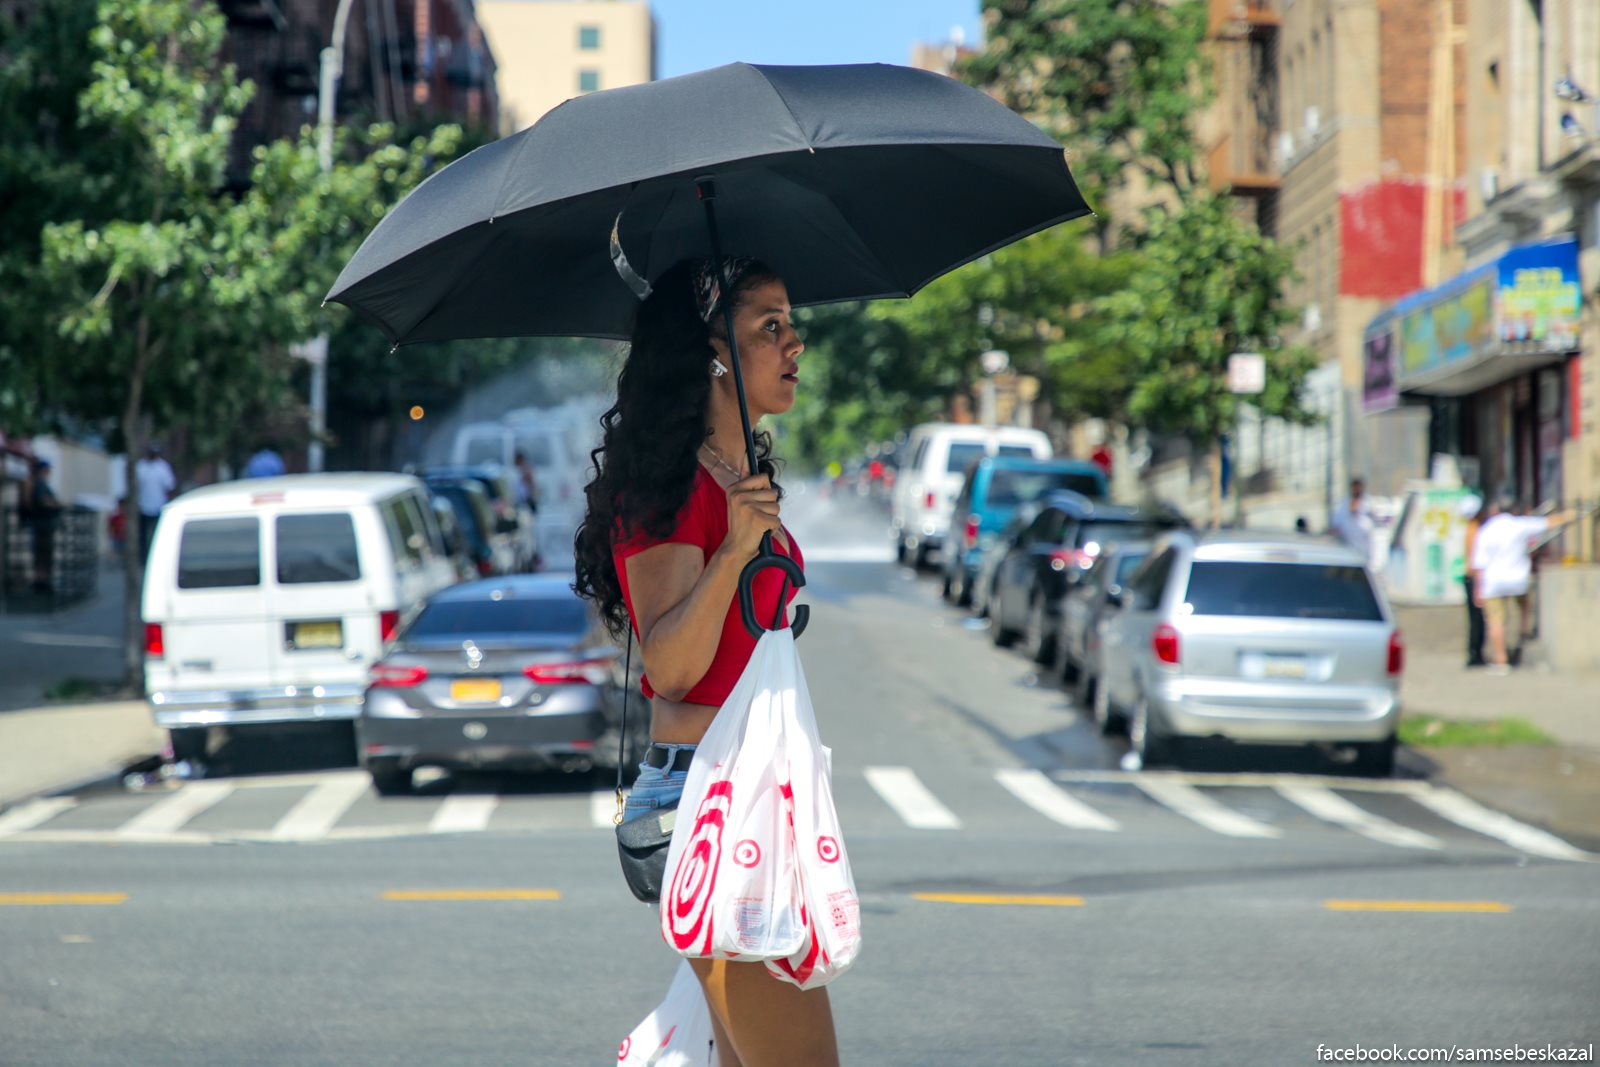 Obycno s zontikami letom hodat odni kitajcy, no tut uze mnogie ne vyderzali.